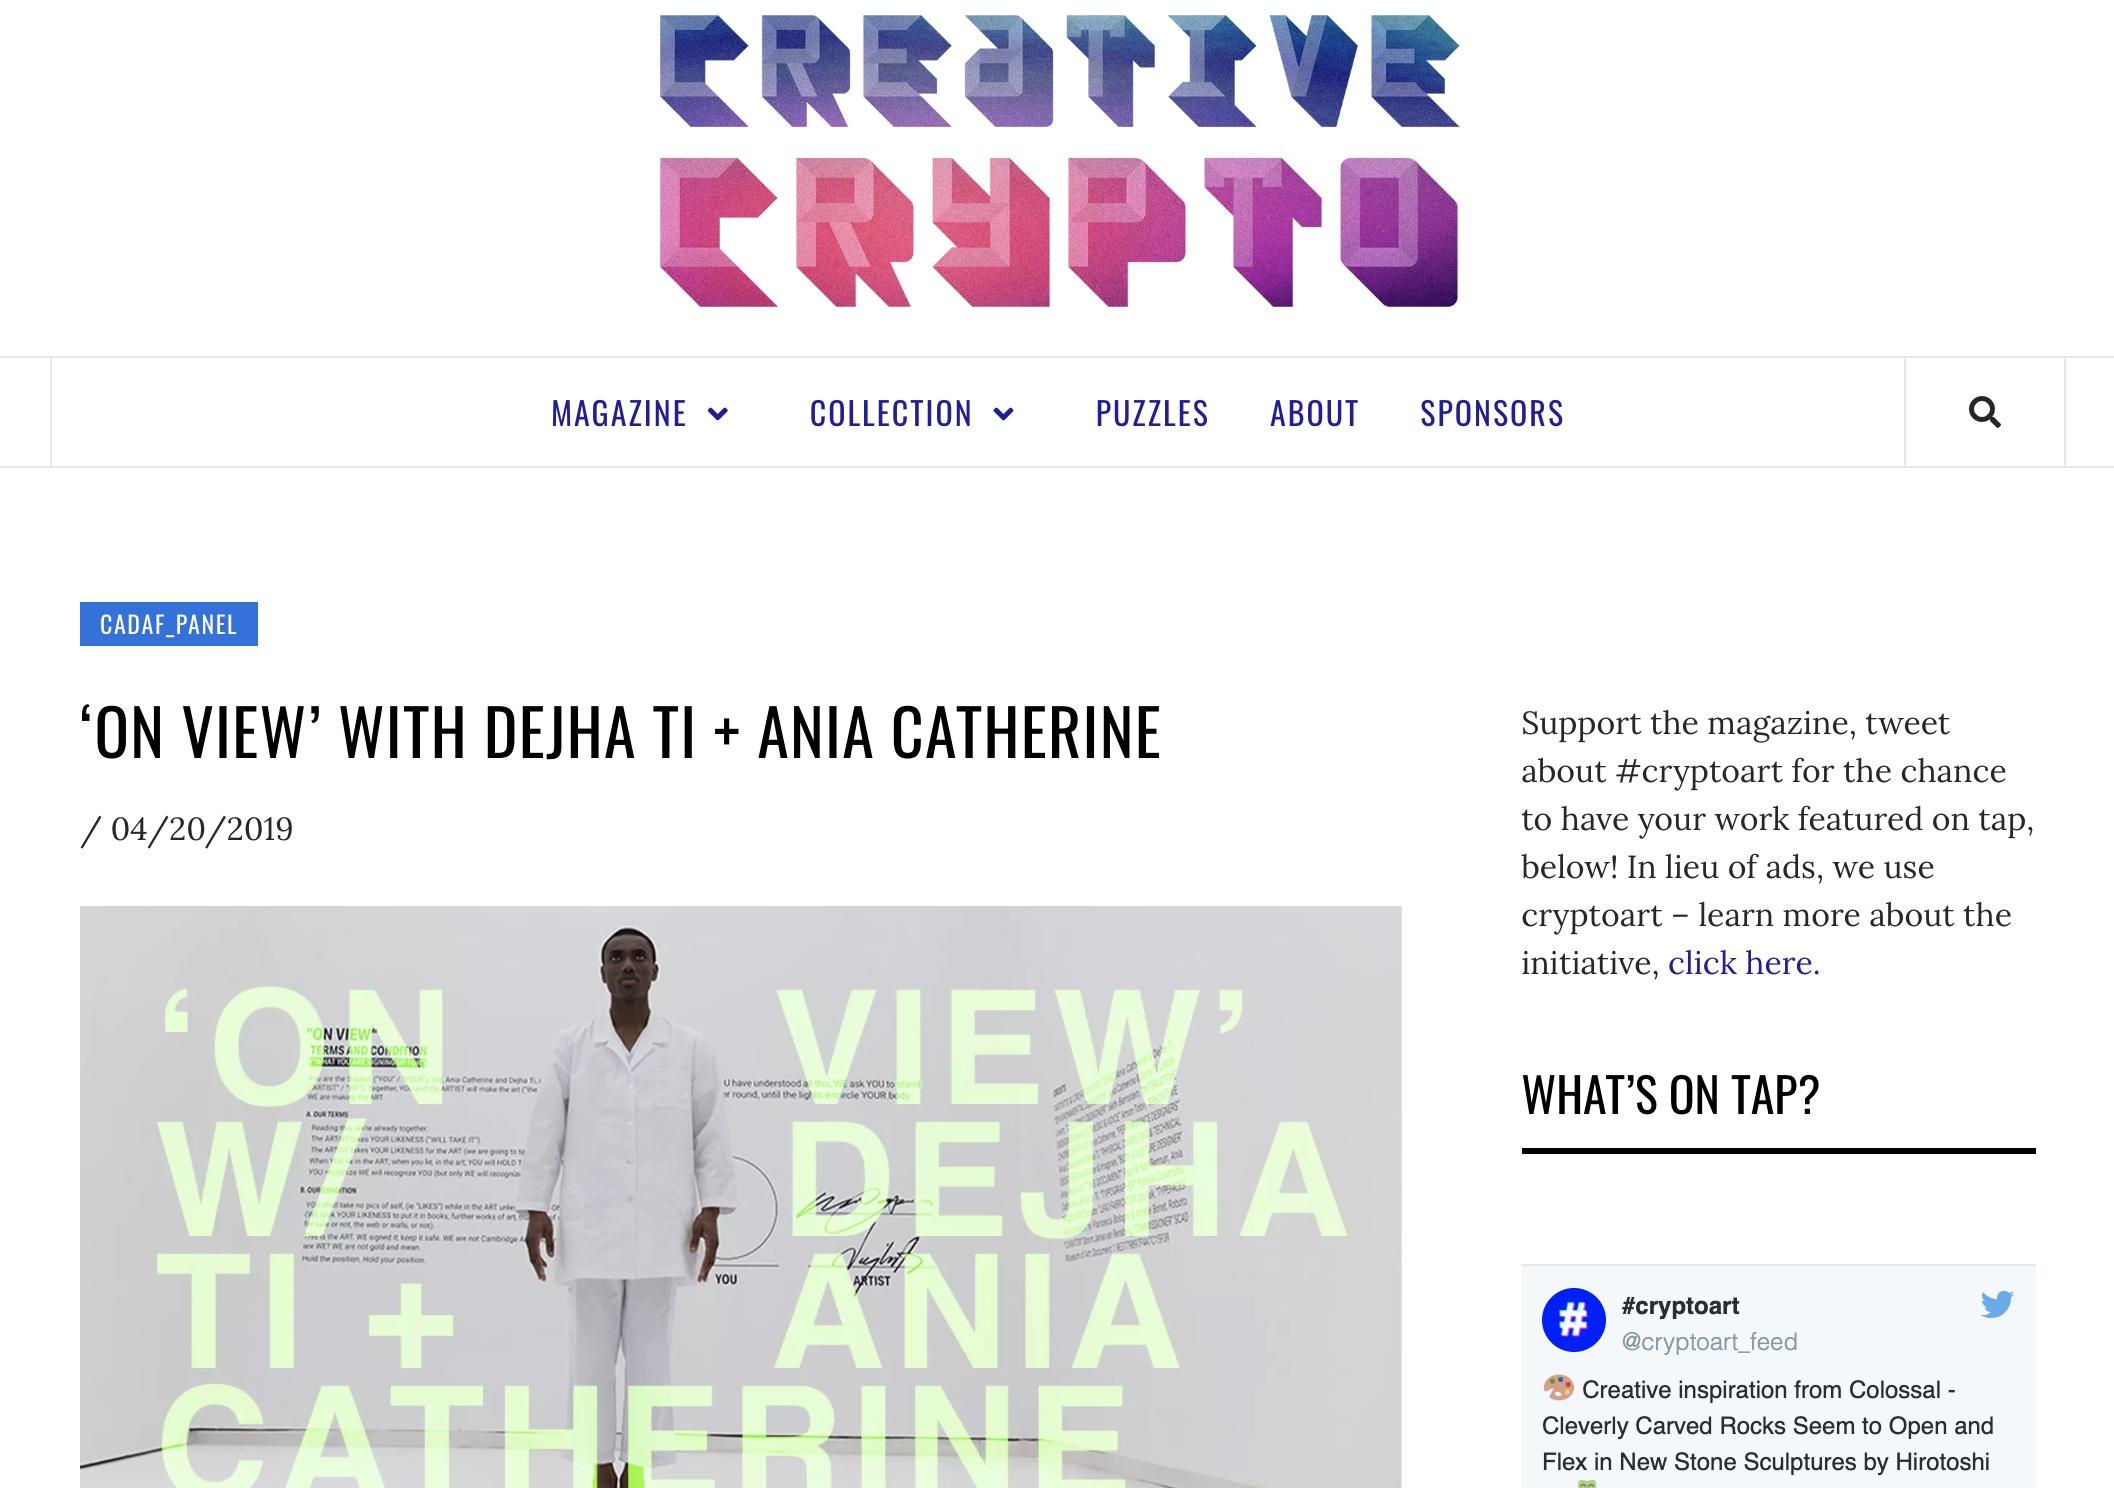 Cadaf-aniacatherine-dejhati-creativecrypto